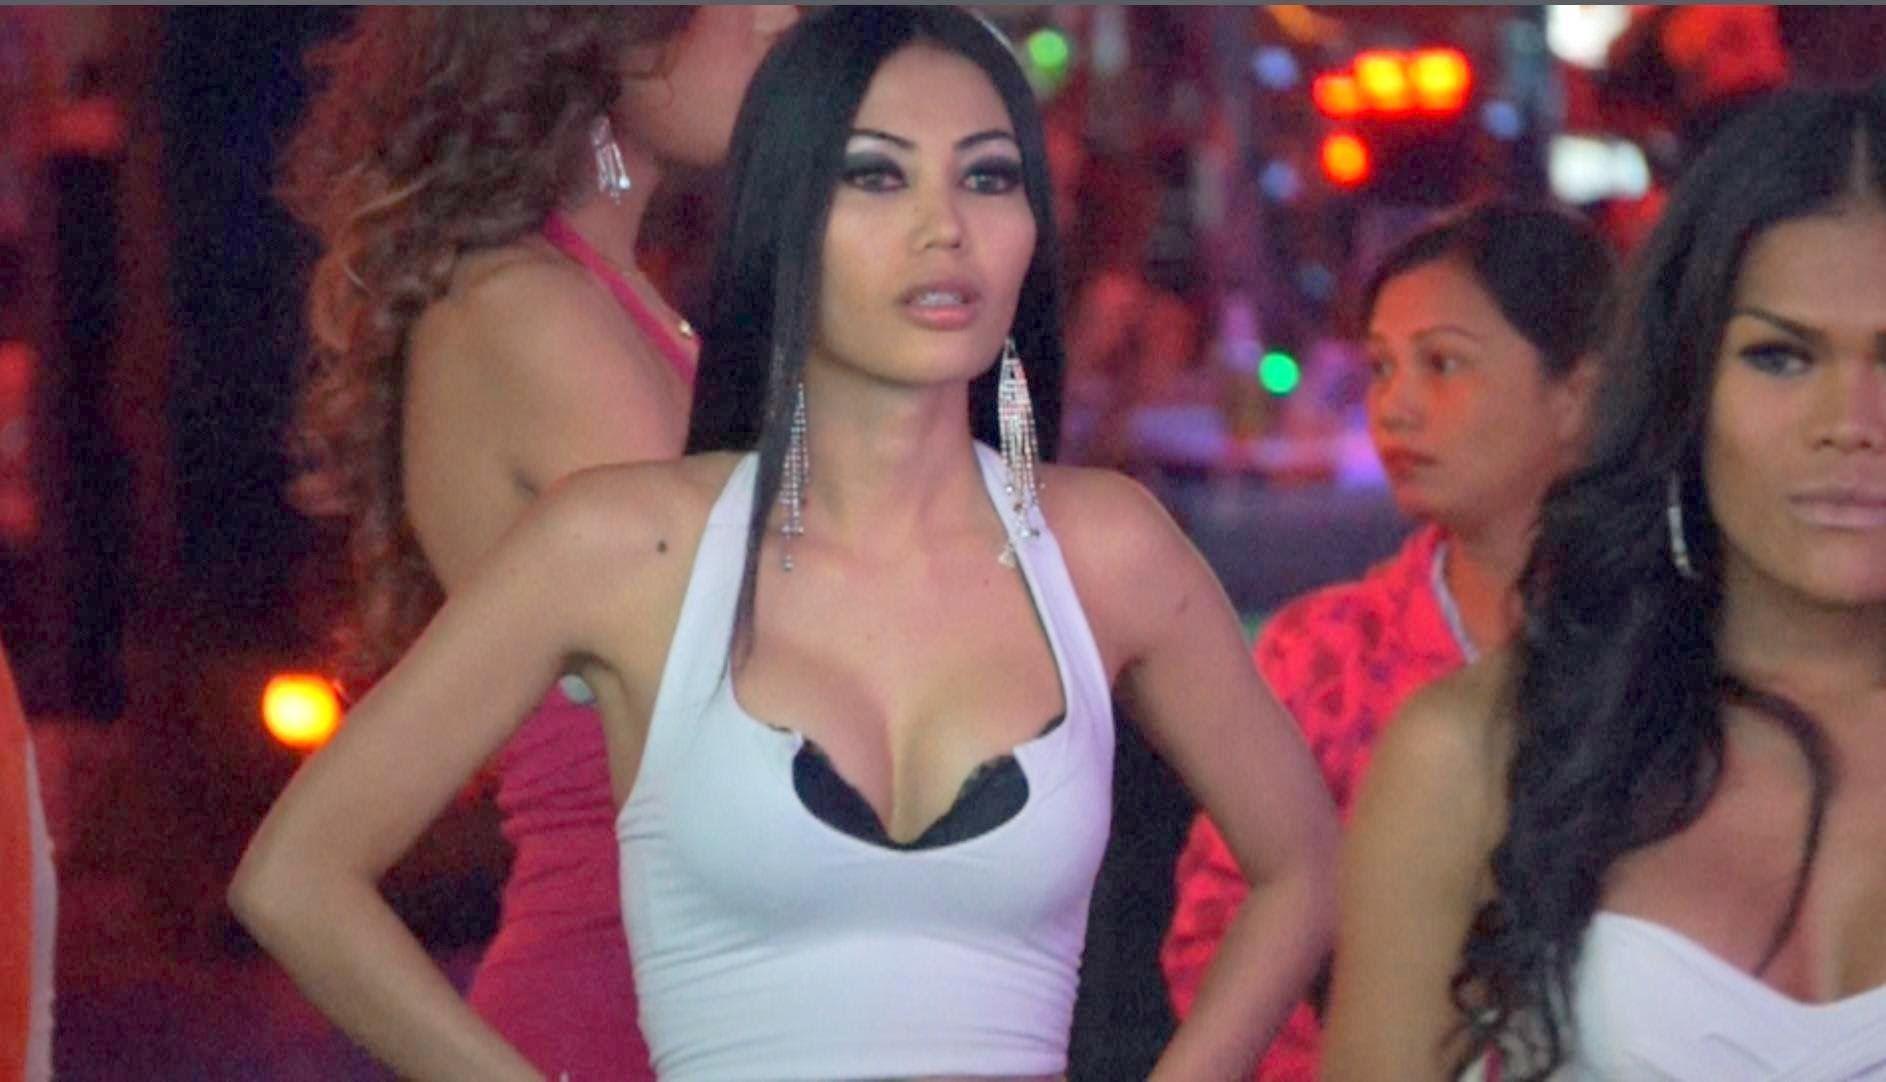 Russian Girls in Pattaya Where to Find Russian Ladies in Pattaya